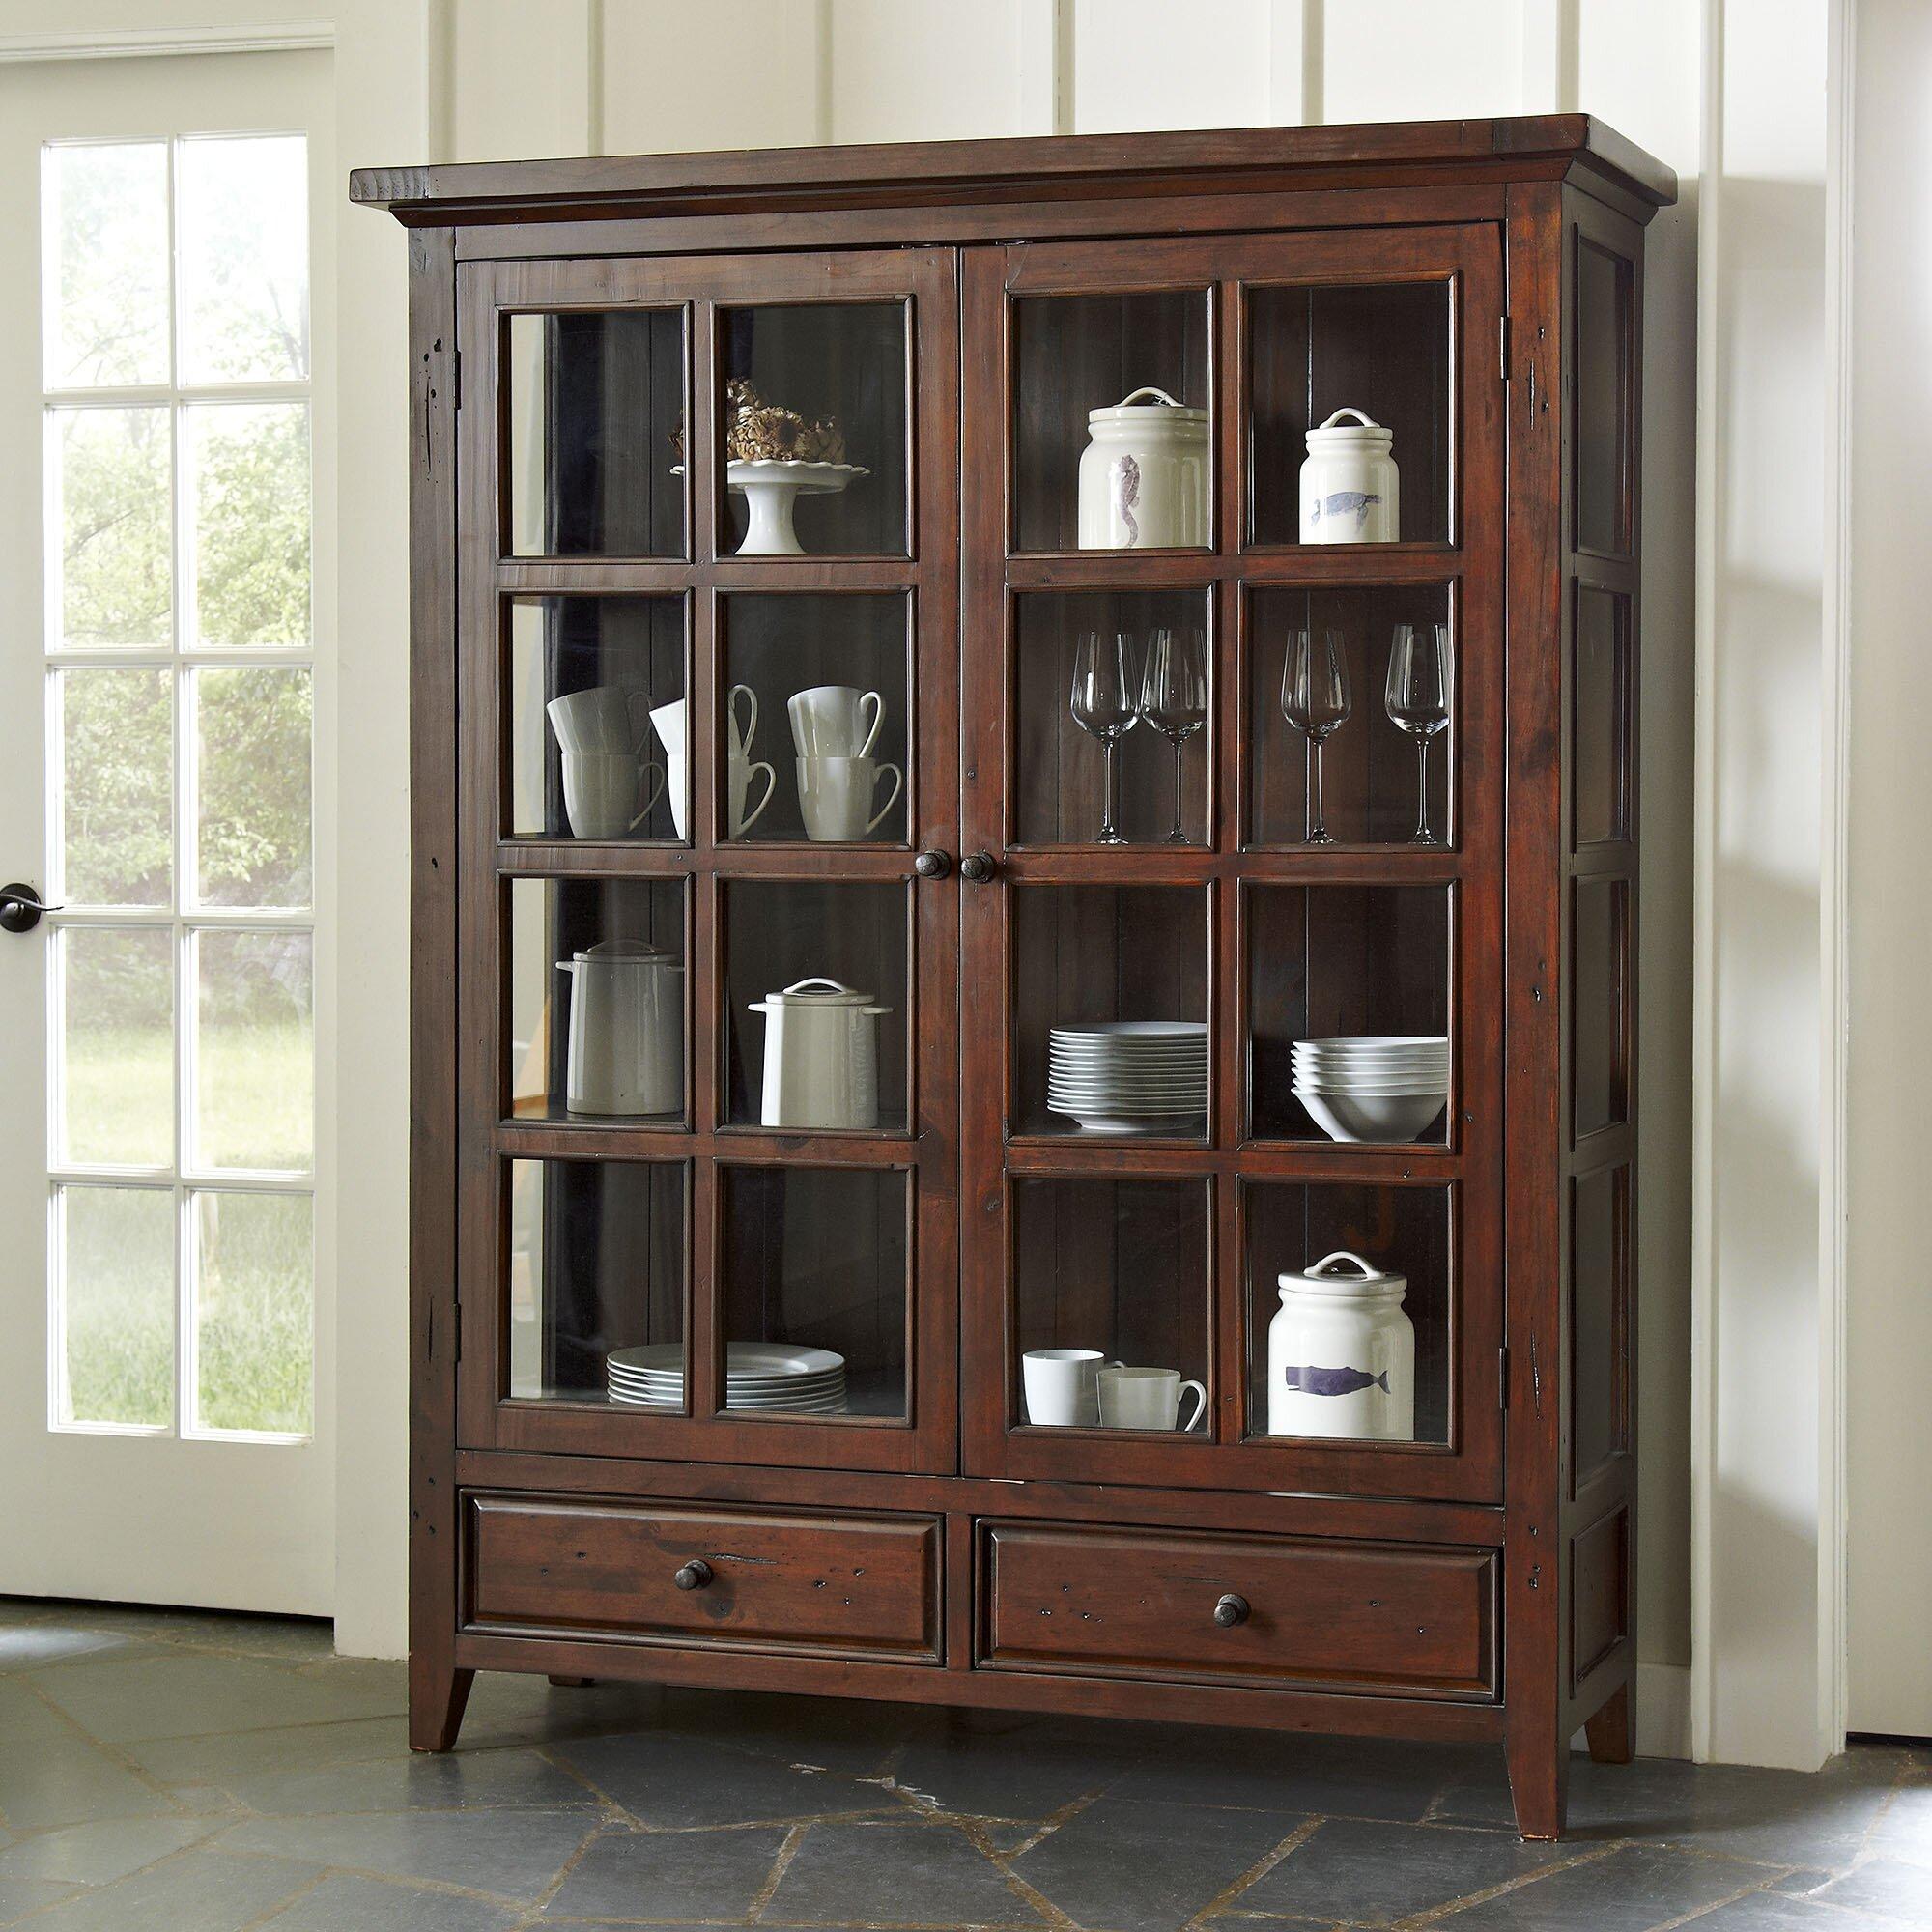 10 Inch Wide Bookcase Tonyswadenalocker Com